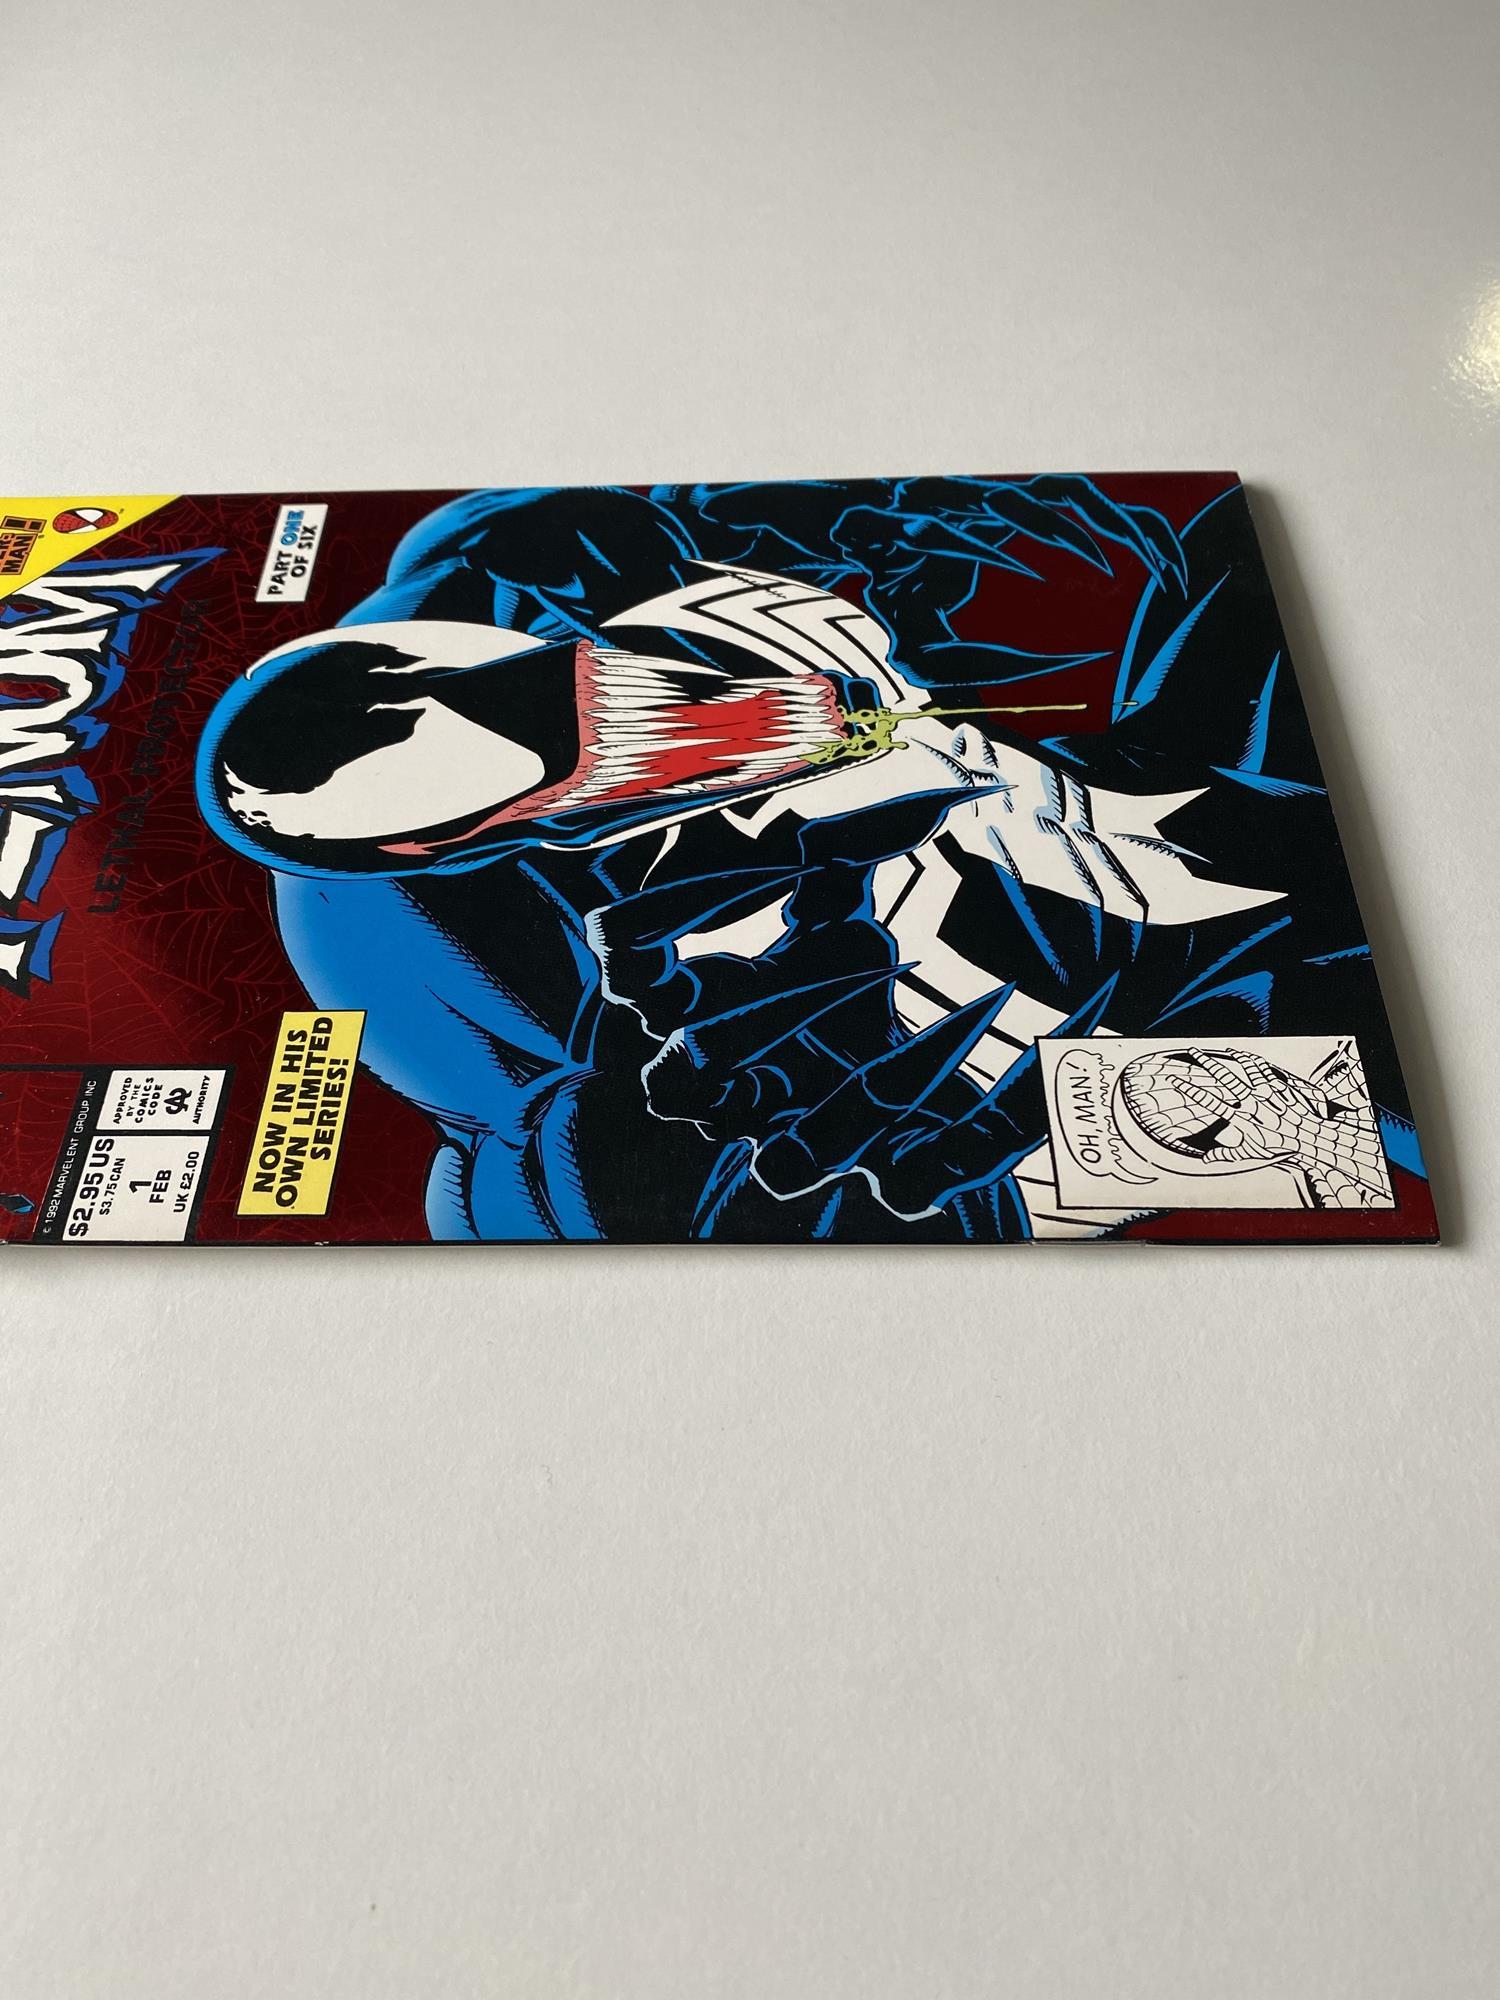 Lot 29 - VENOM: LETHAL PROTECTOR # 1 (1993 - MARVEL - Cents/Pence Copy) - First Venom solo title + Spider-Man